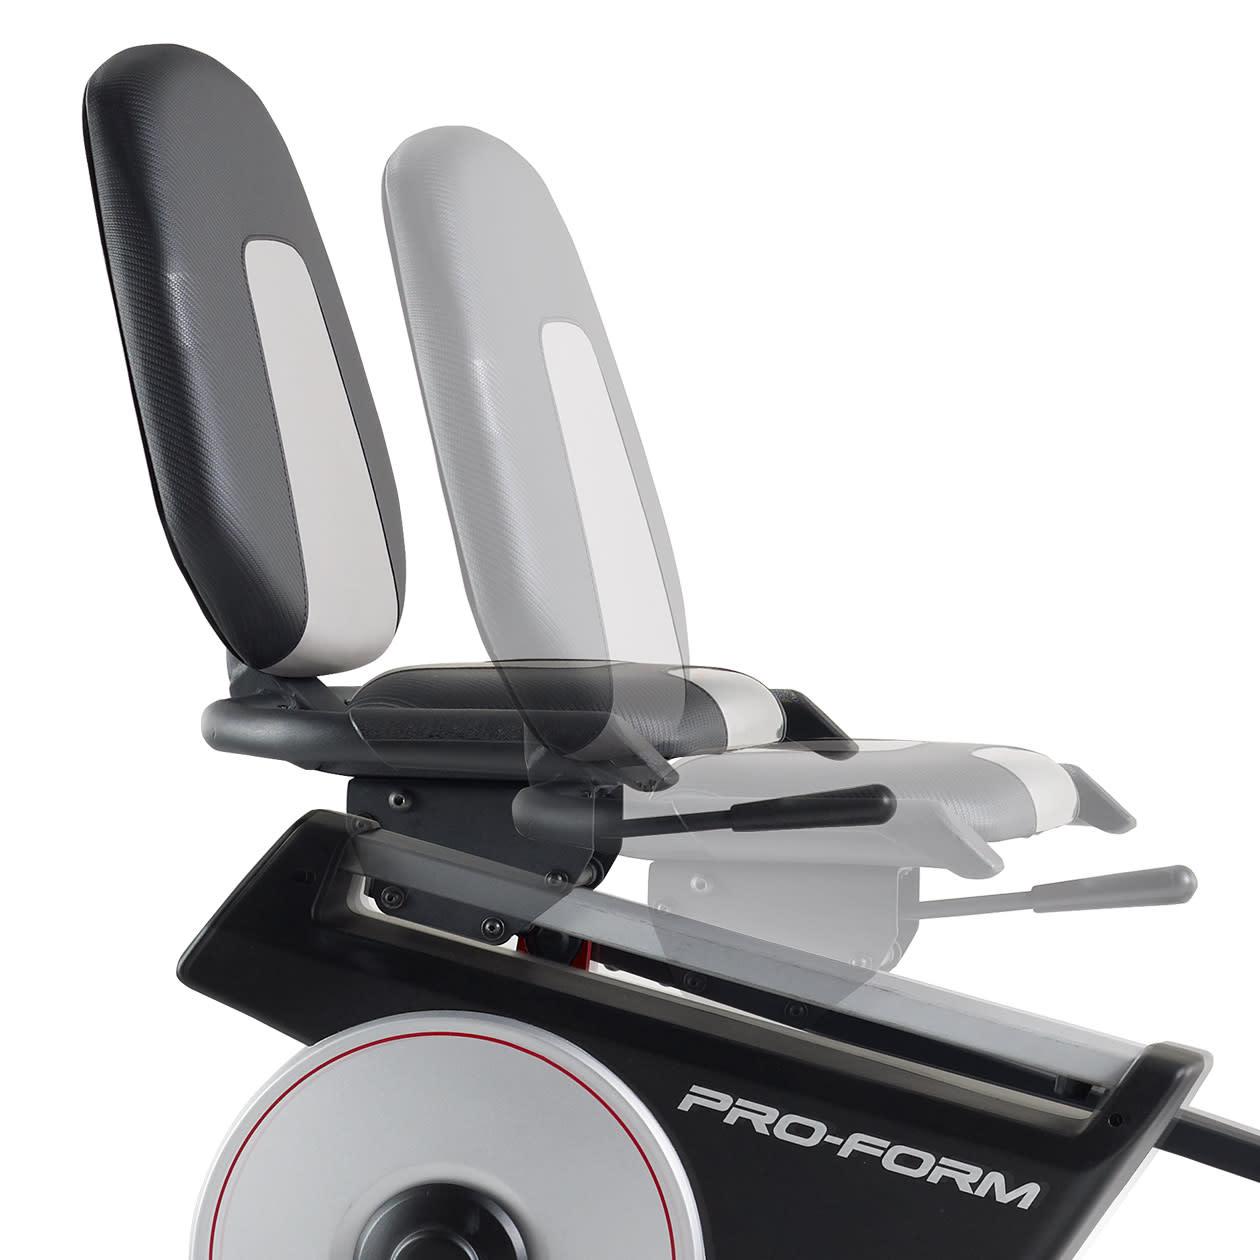 Proform Hybrid Trainers Hybrid Trainer Pro  gallery image 5